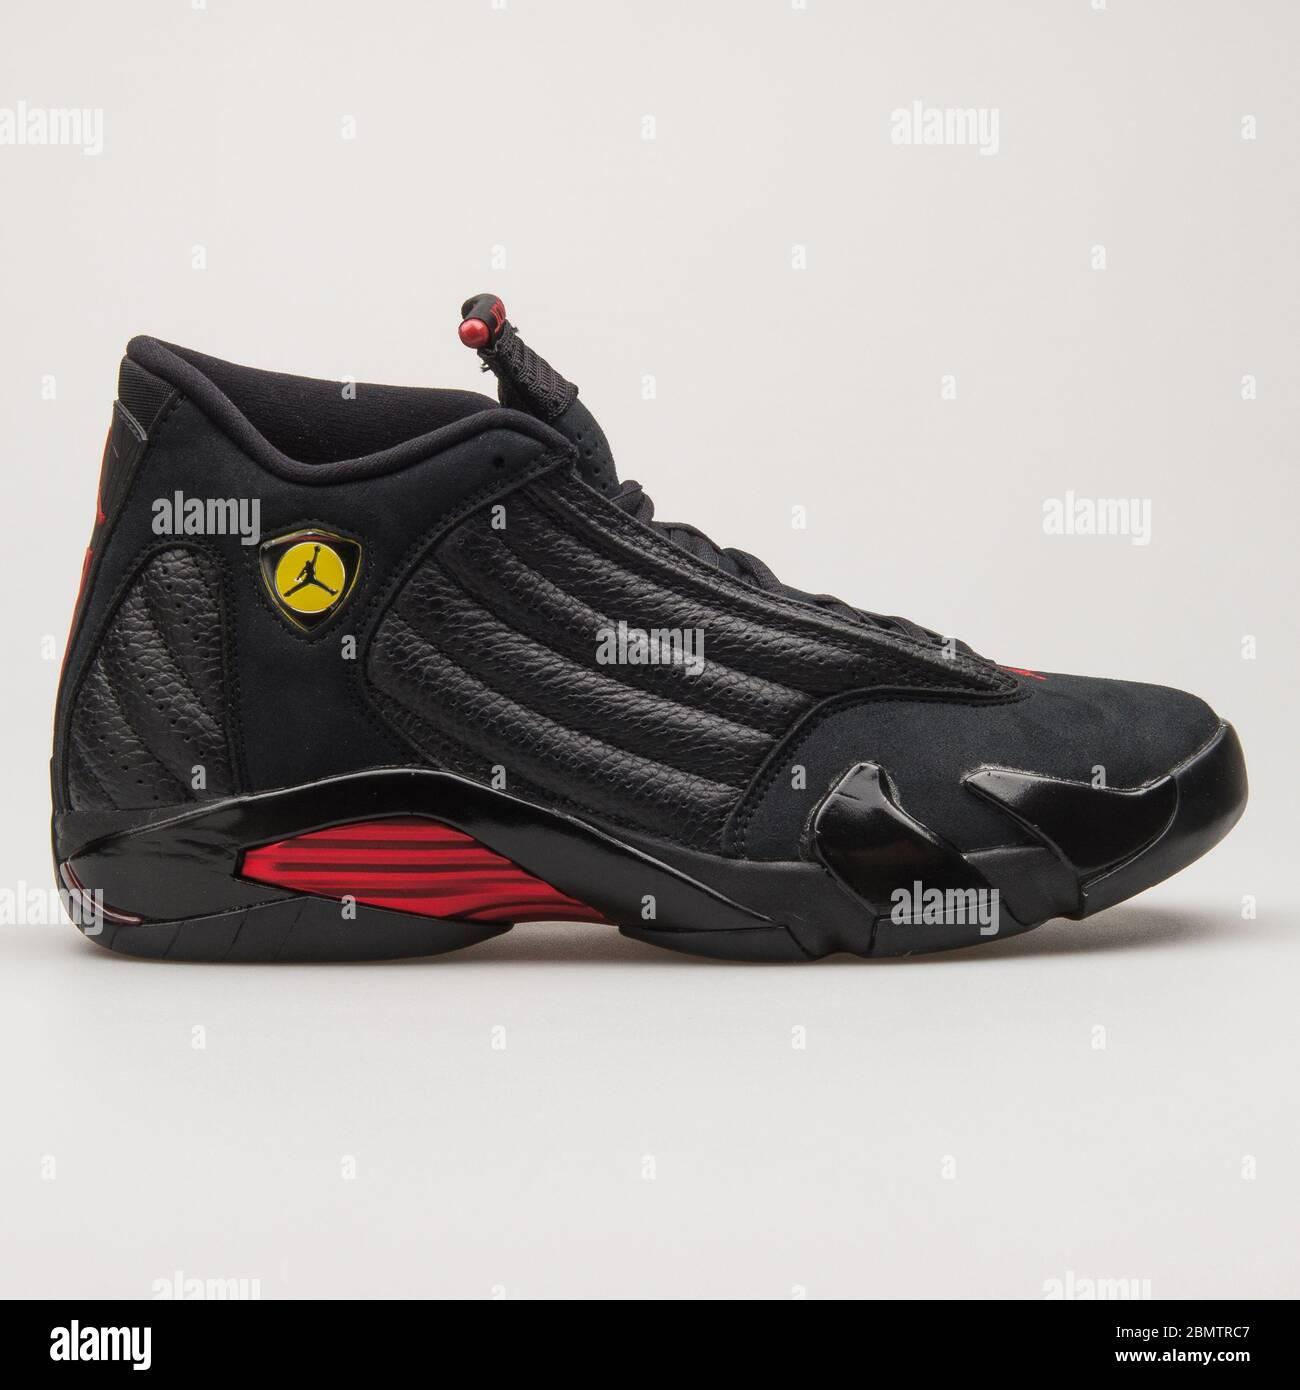 Nike Air Jordan 14 Retro black